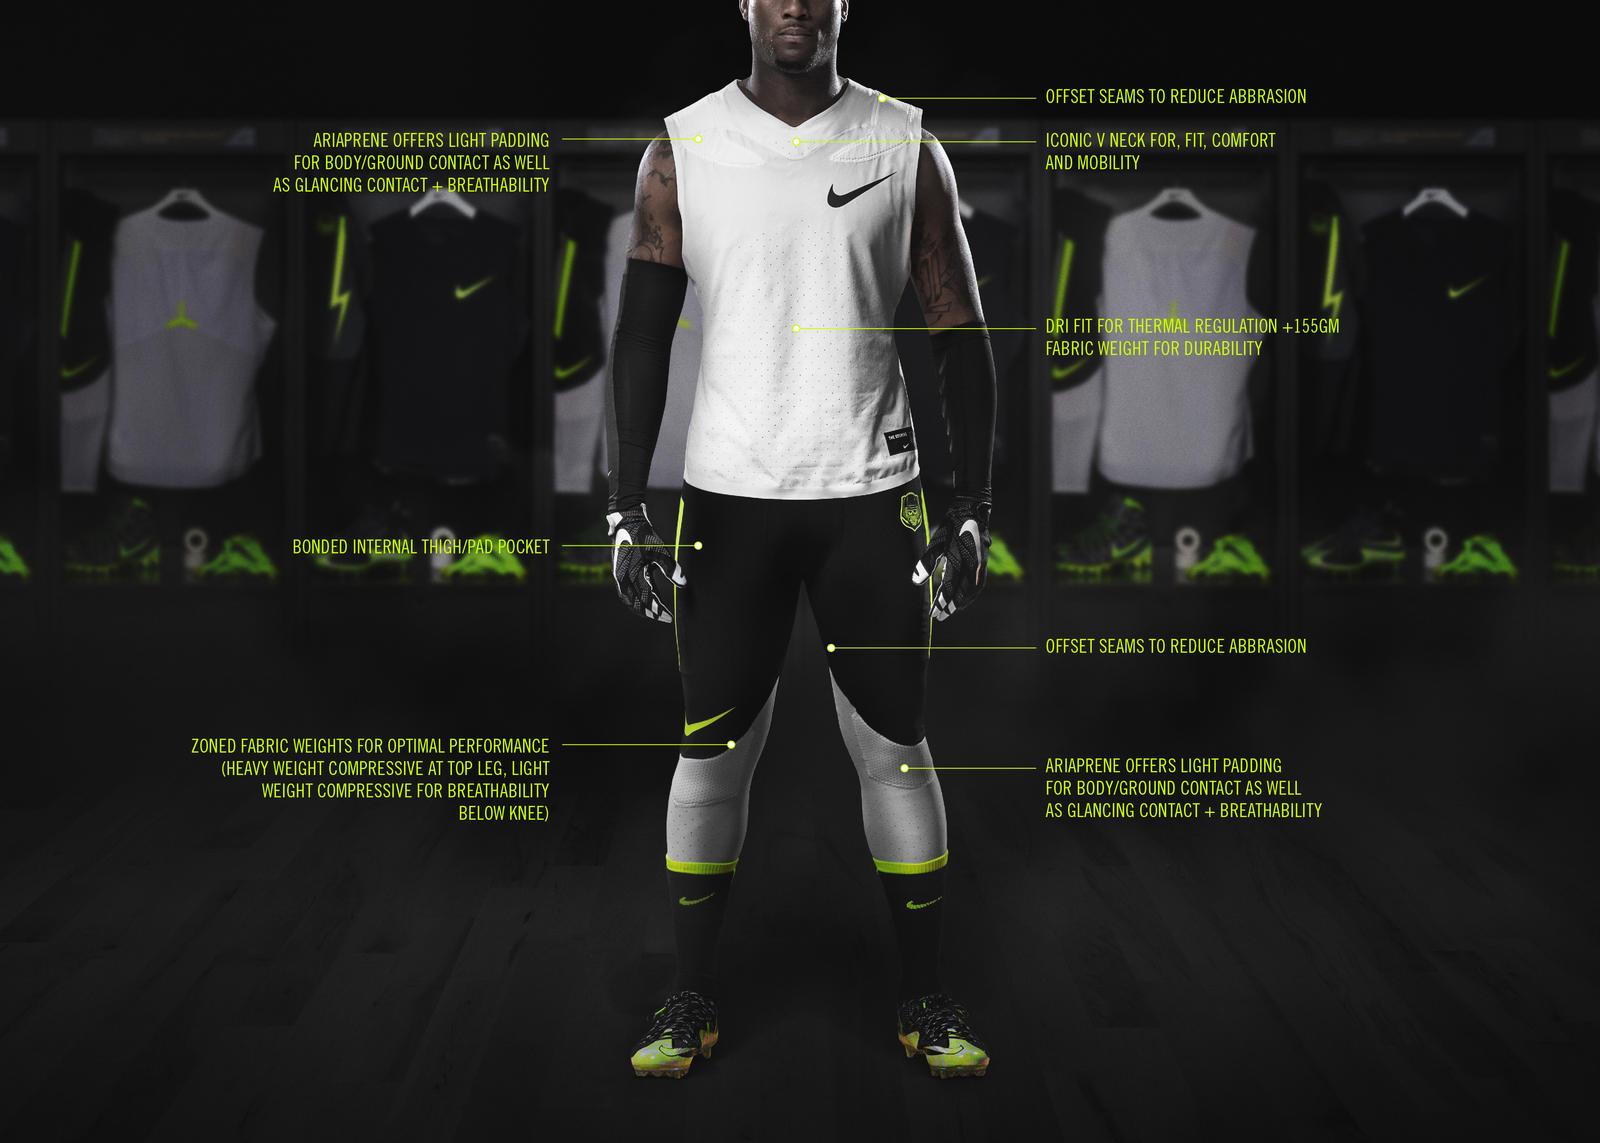 Nike locker room hero tech 01 rectangle 1600